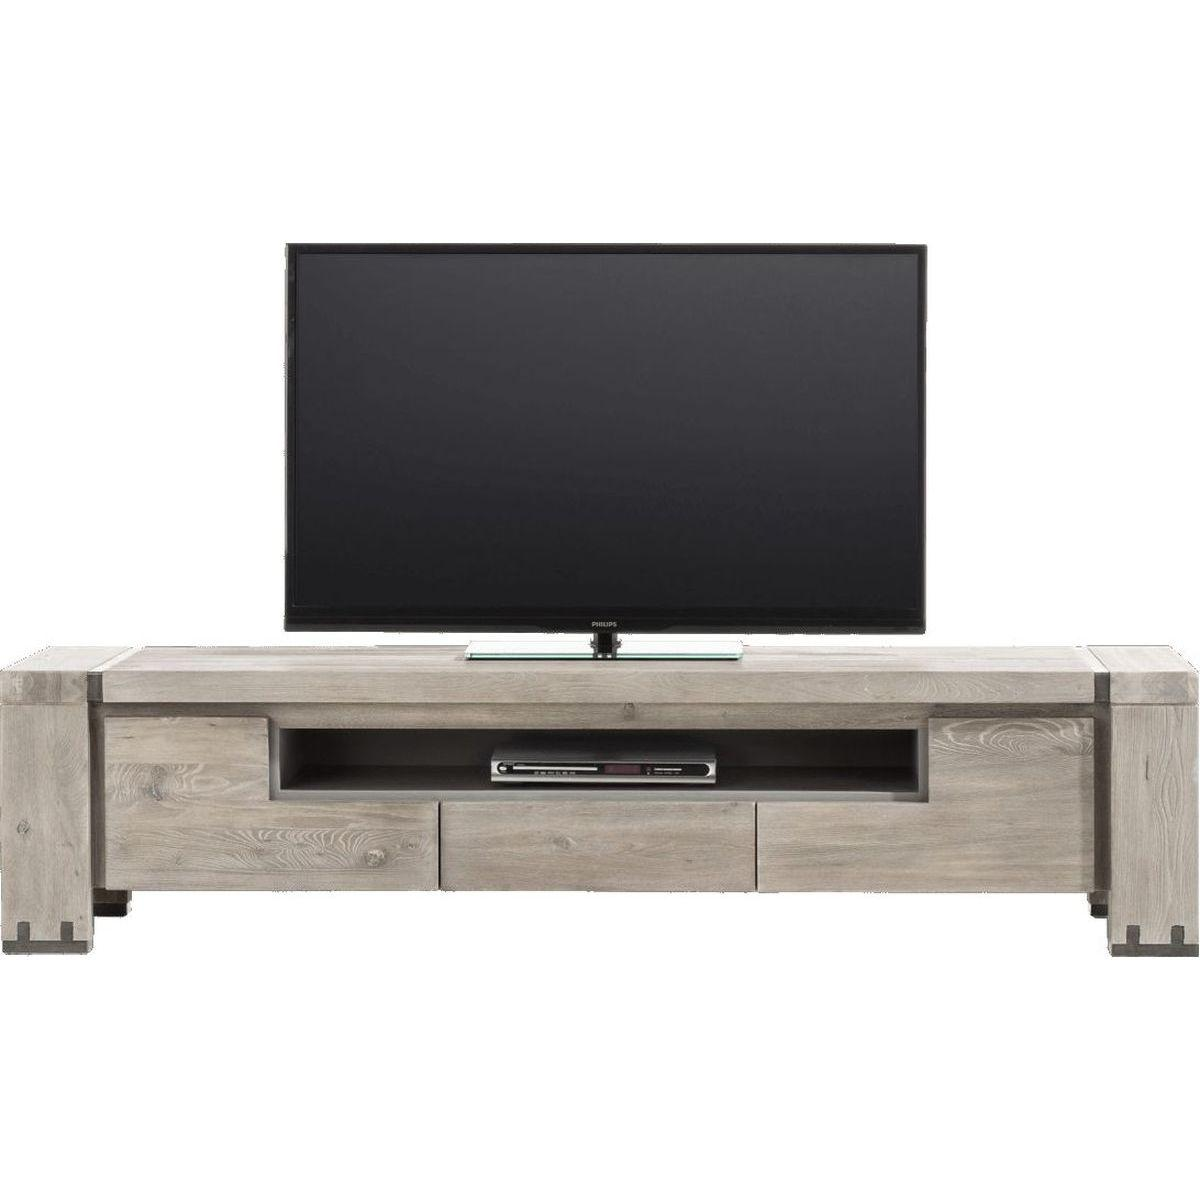 AVOLA by H&H Meuble TV 190cm